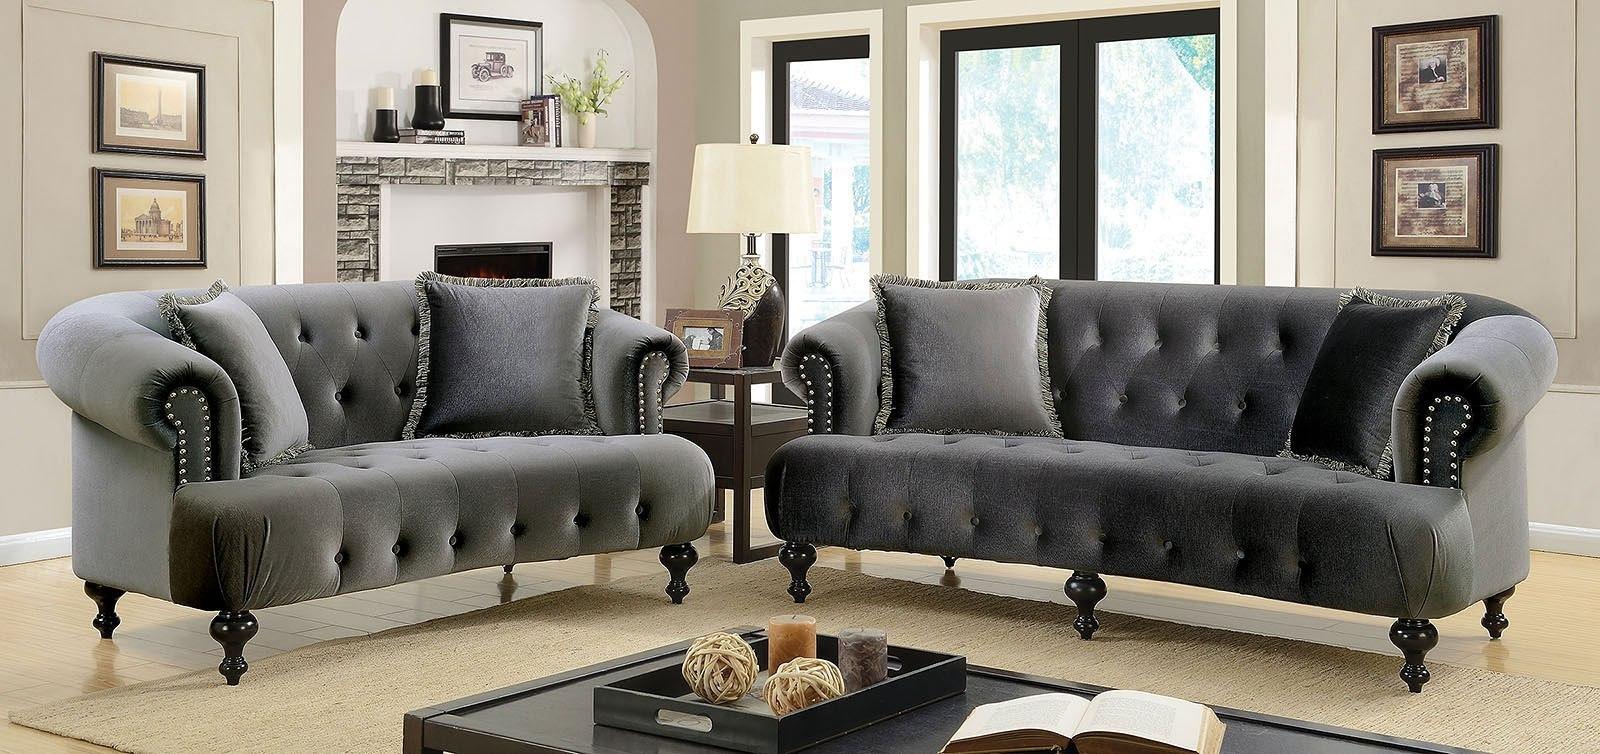 Rayne Living Room Set (Gray) by Furniture of America   FurniturePick